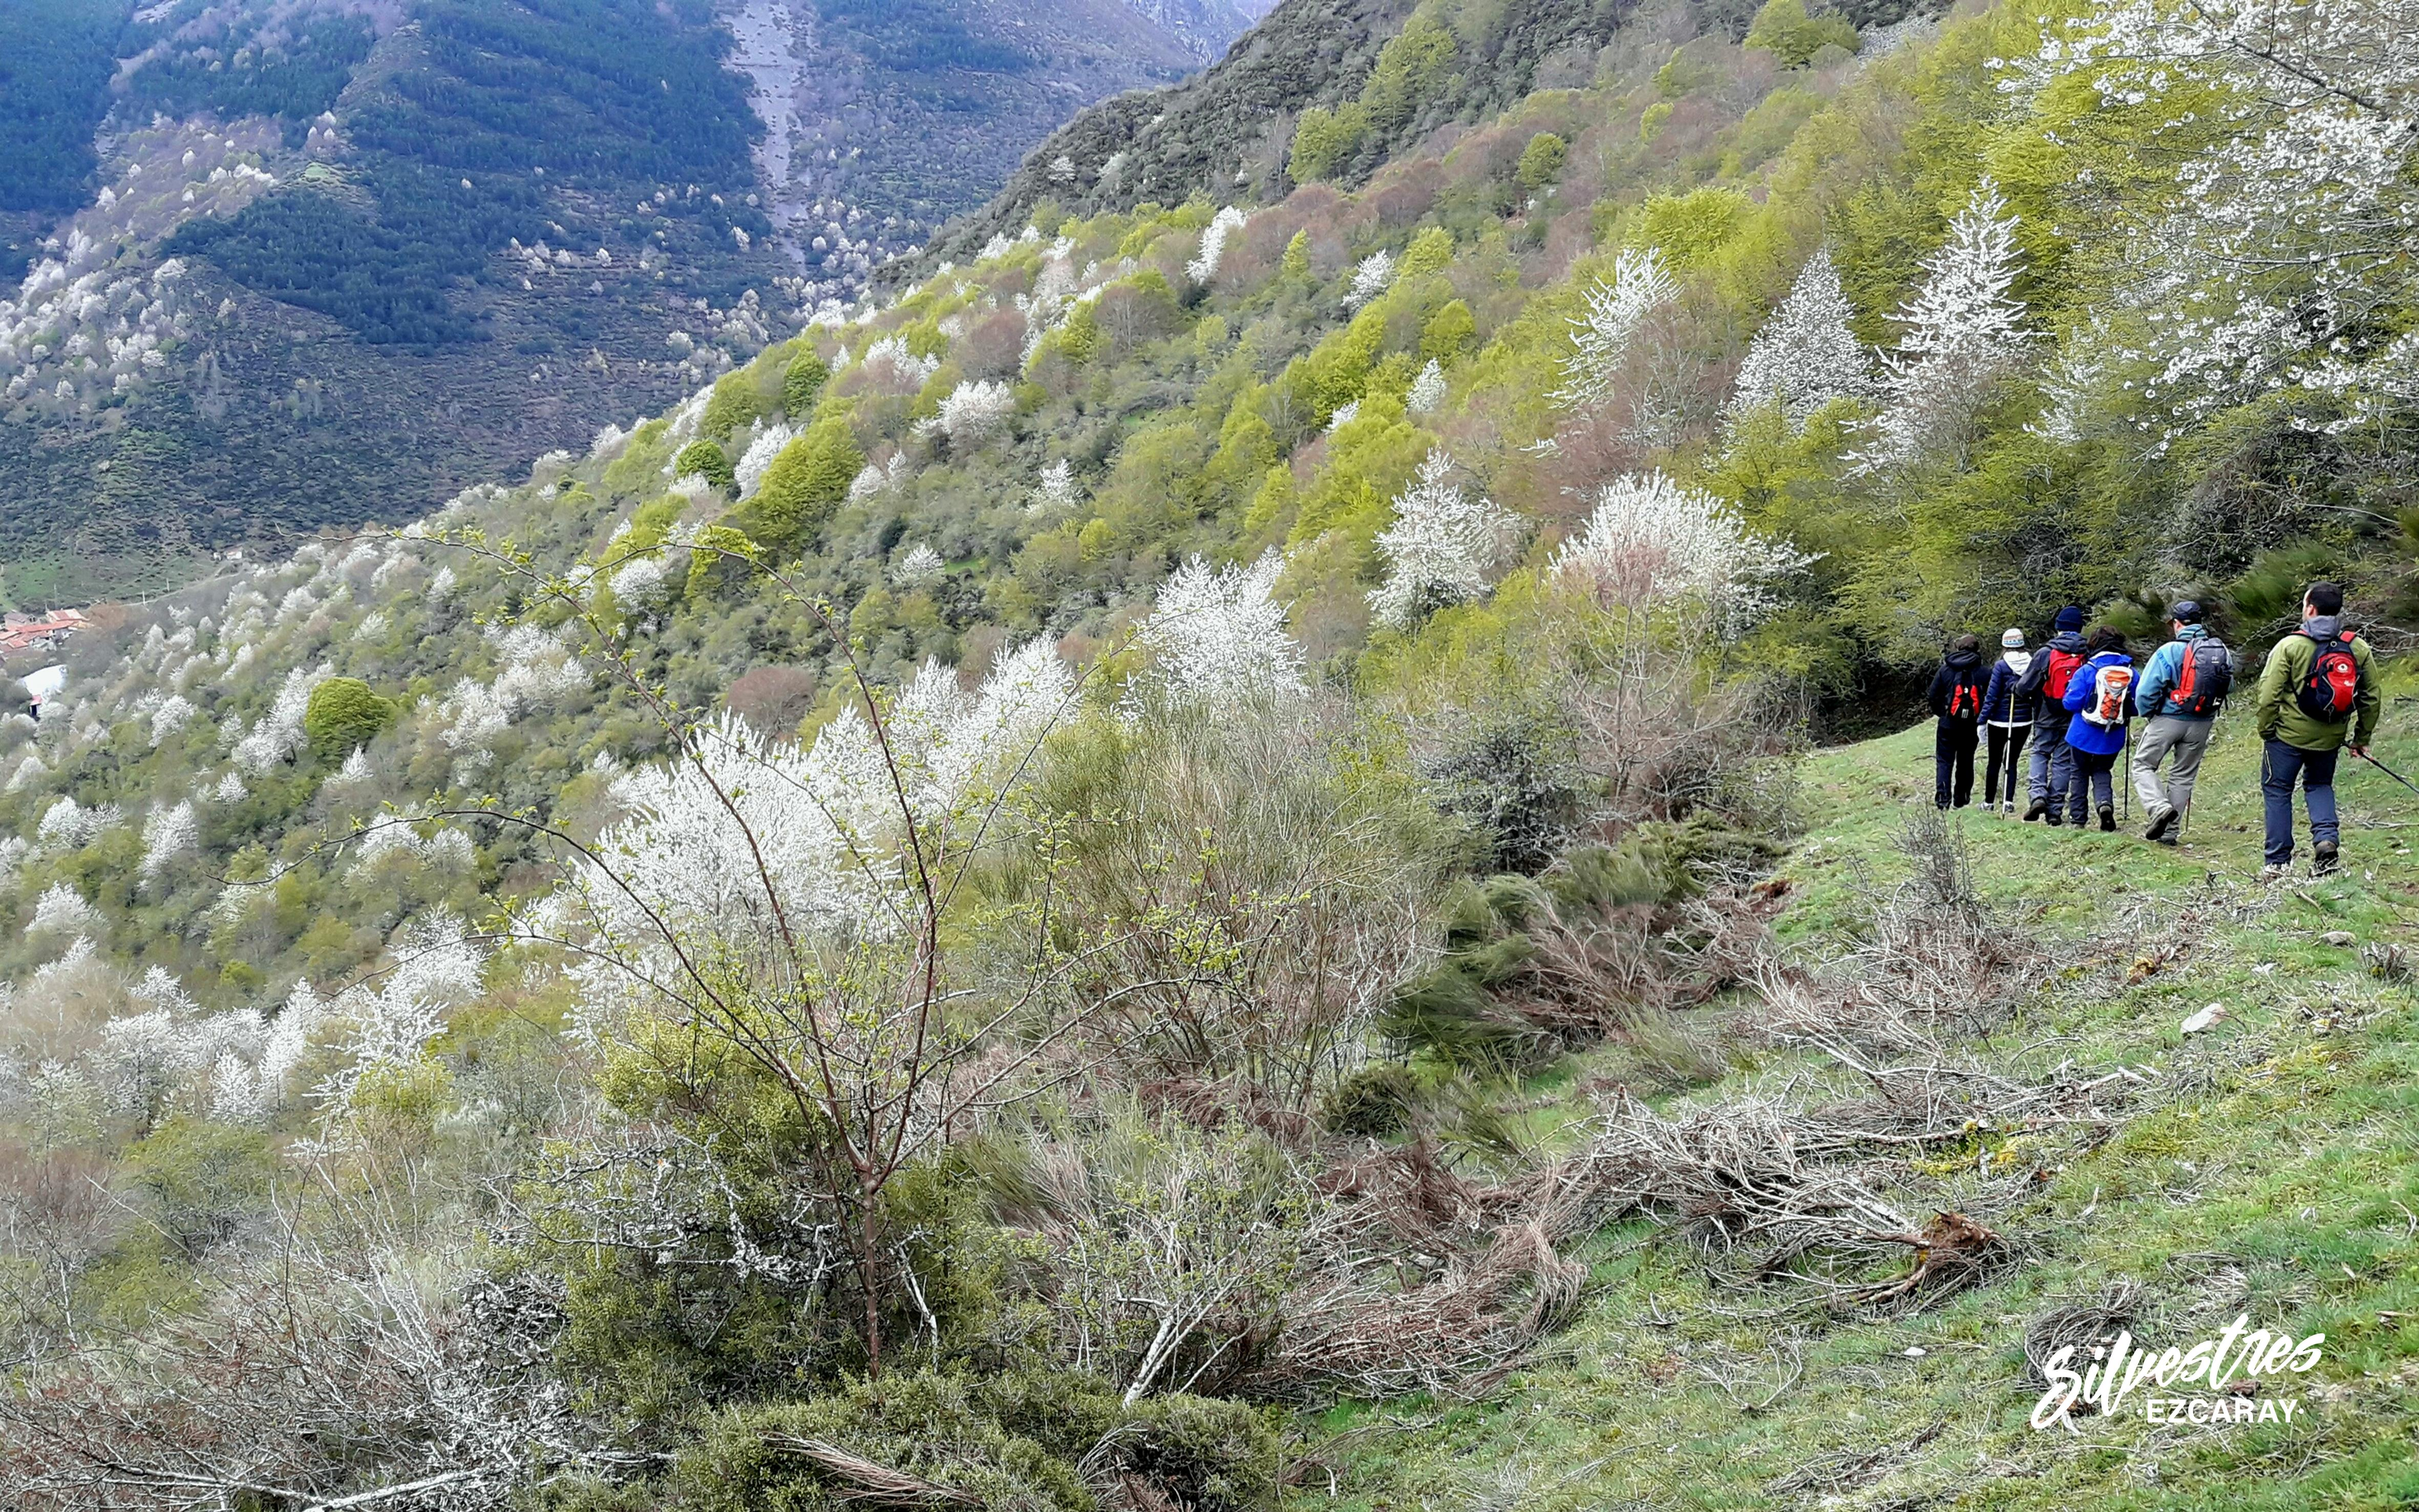 rutas_paisajes_primavera_que_ver_ezcaray_guia_naturaleza_cerezos_flora